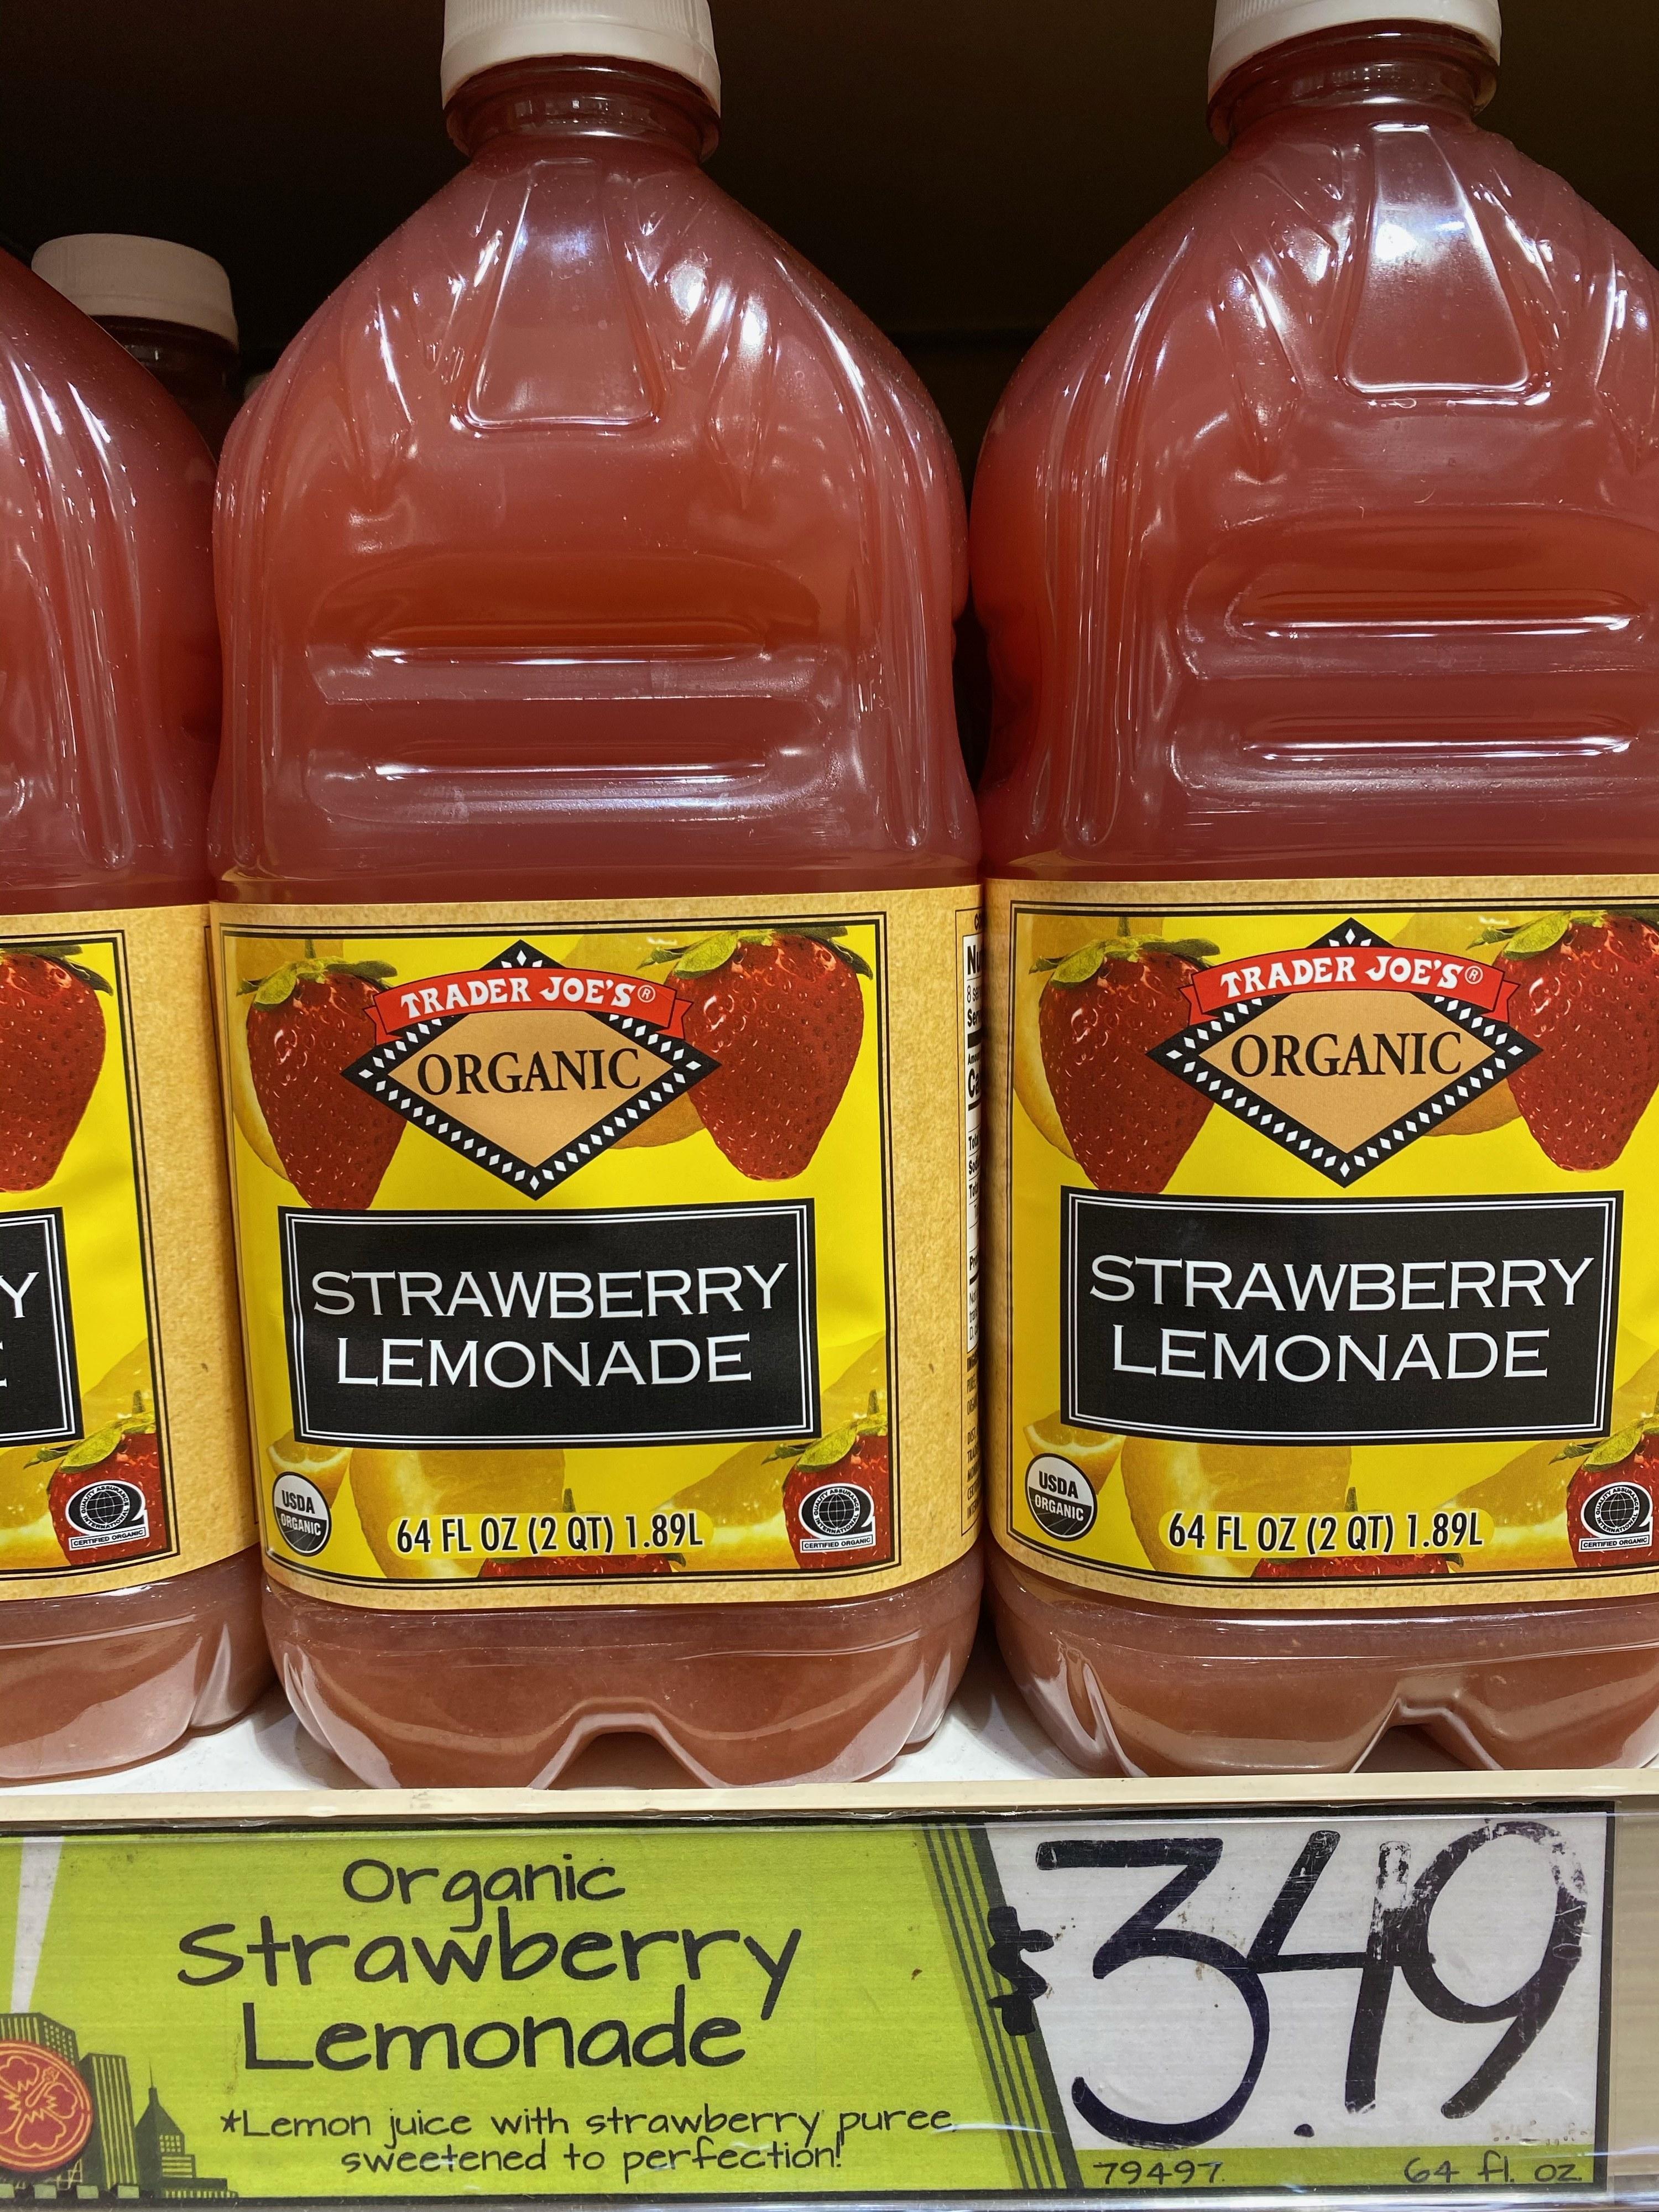 Trader Joe's strawberry lemonade.